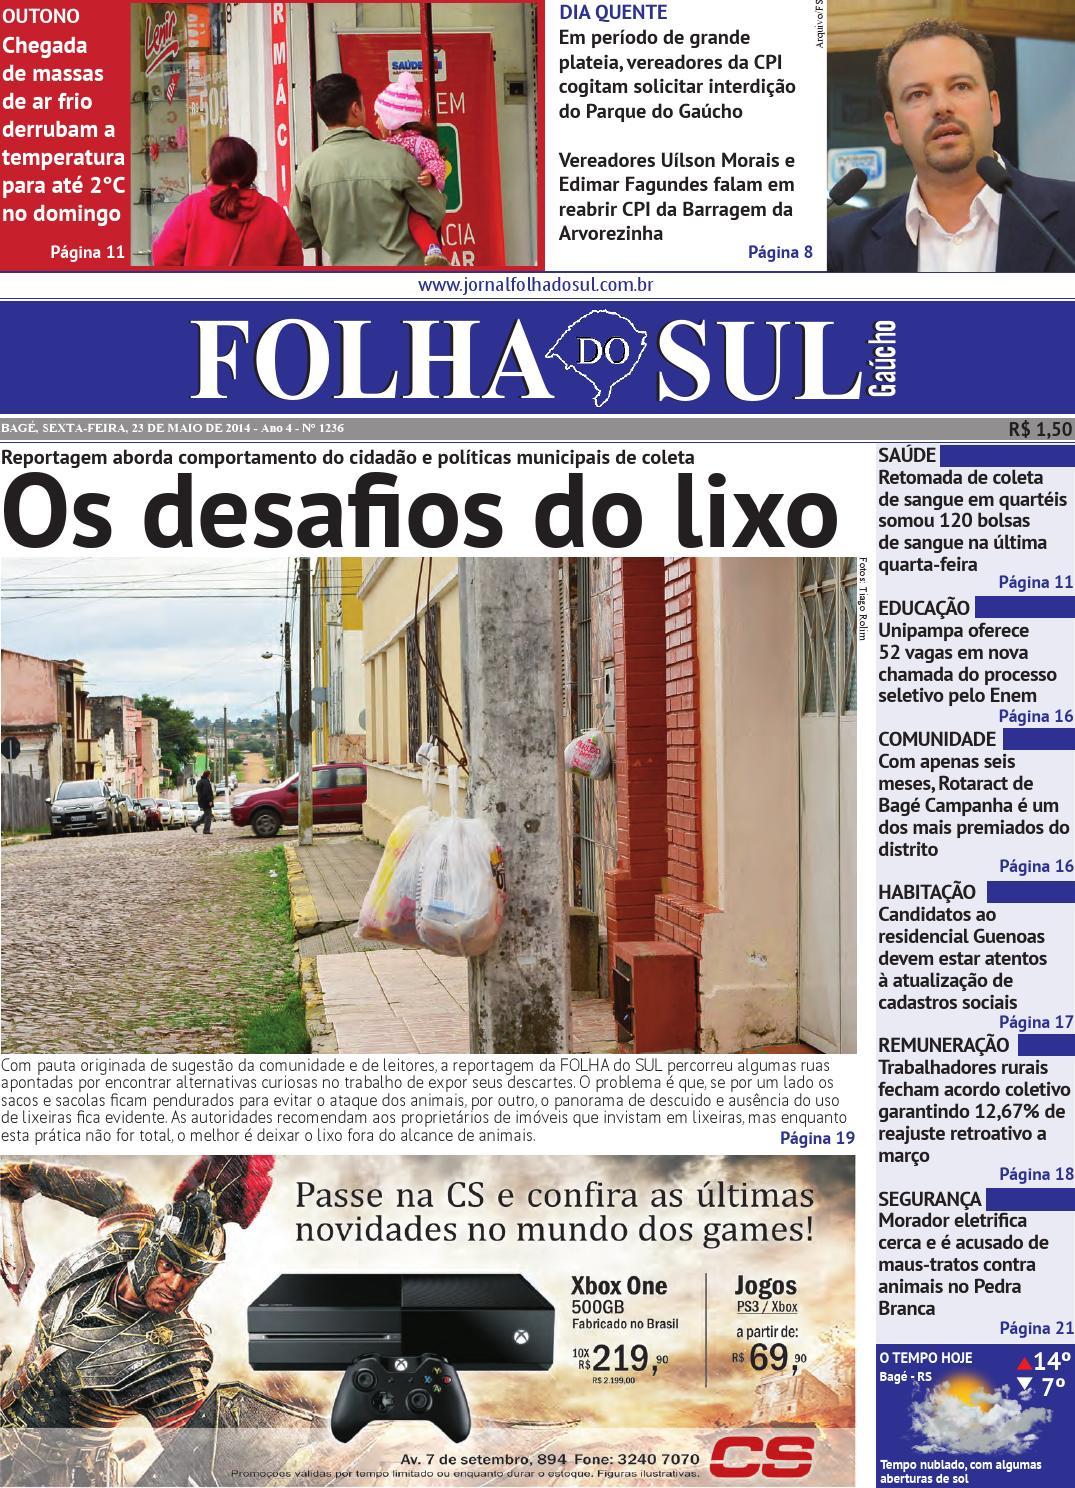 4d93df97d Folha do Sul Gaúcho Ed. 1236 (23/05/2014) by Folha do Sul Gaúcho - issuu